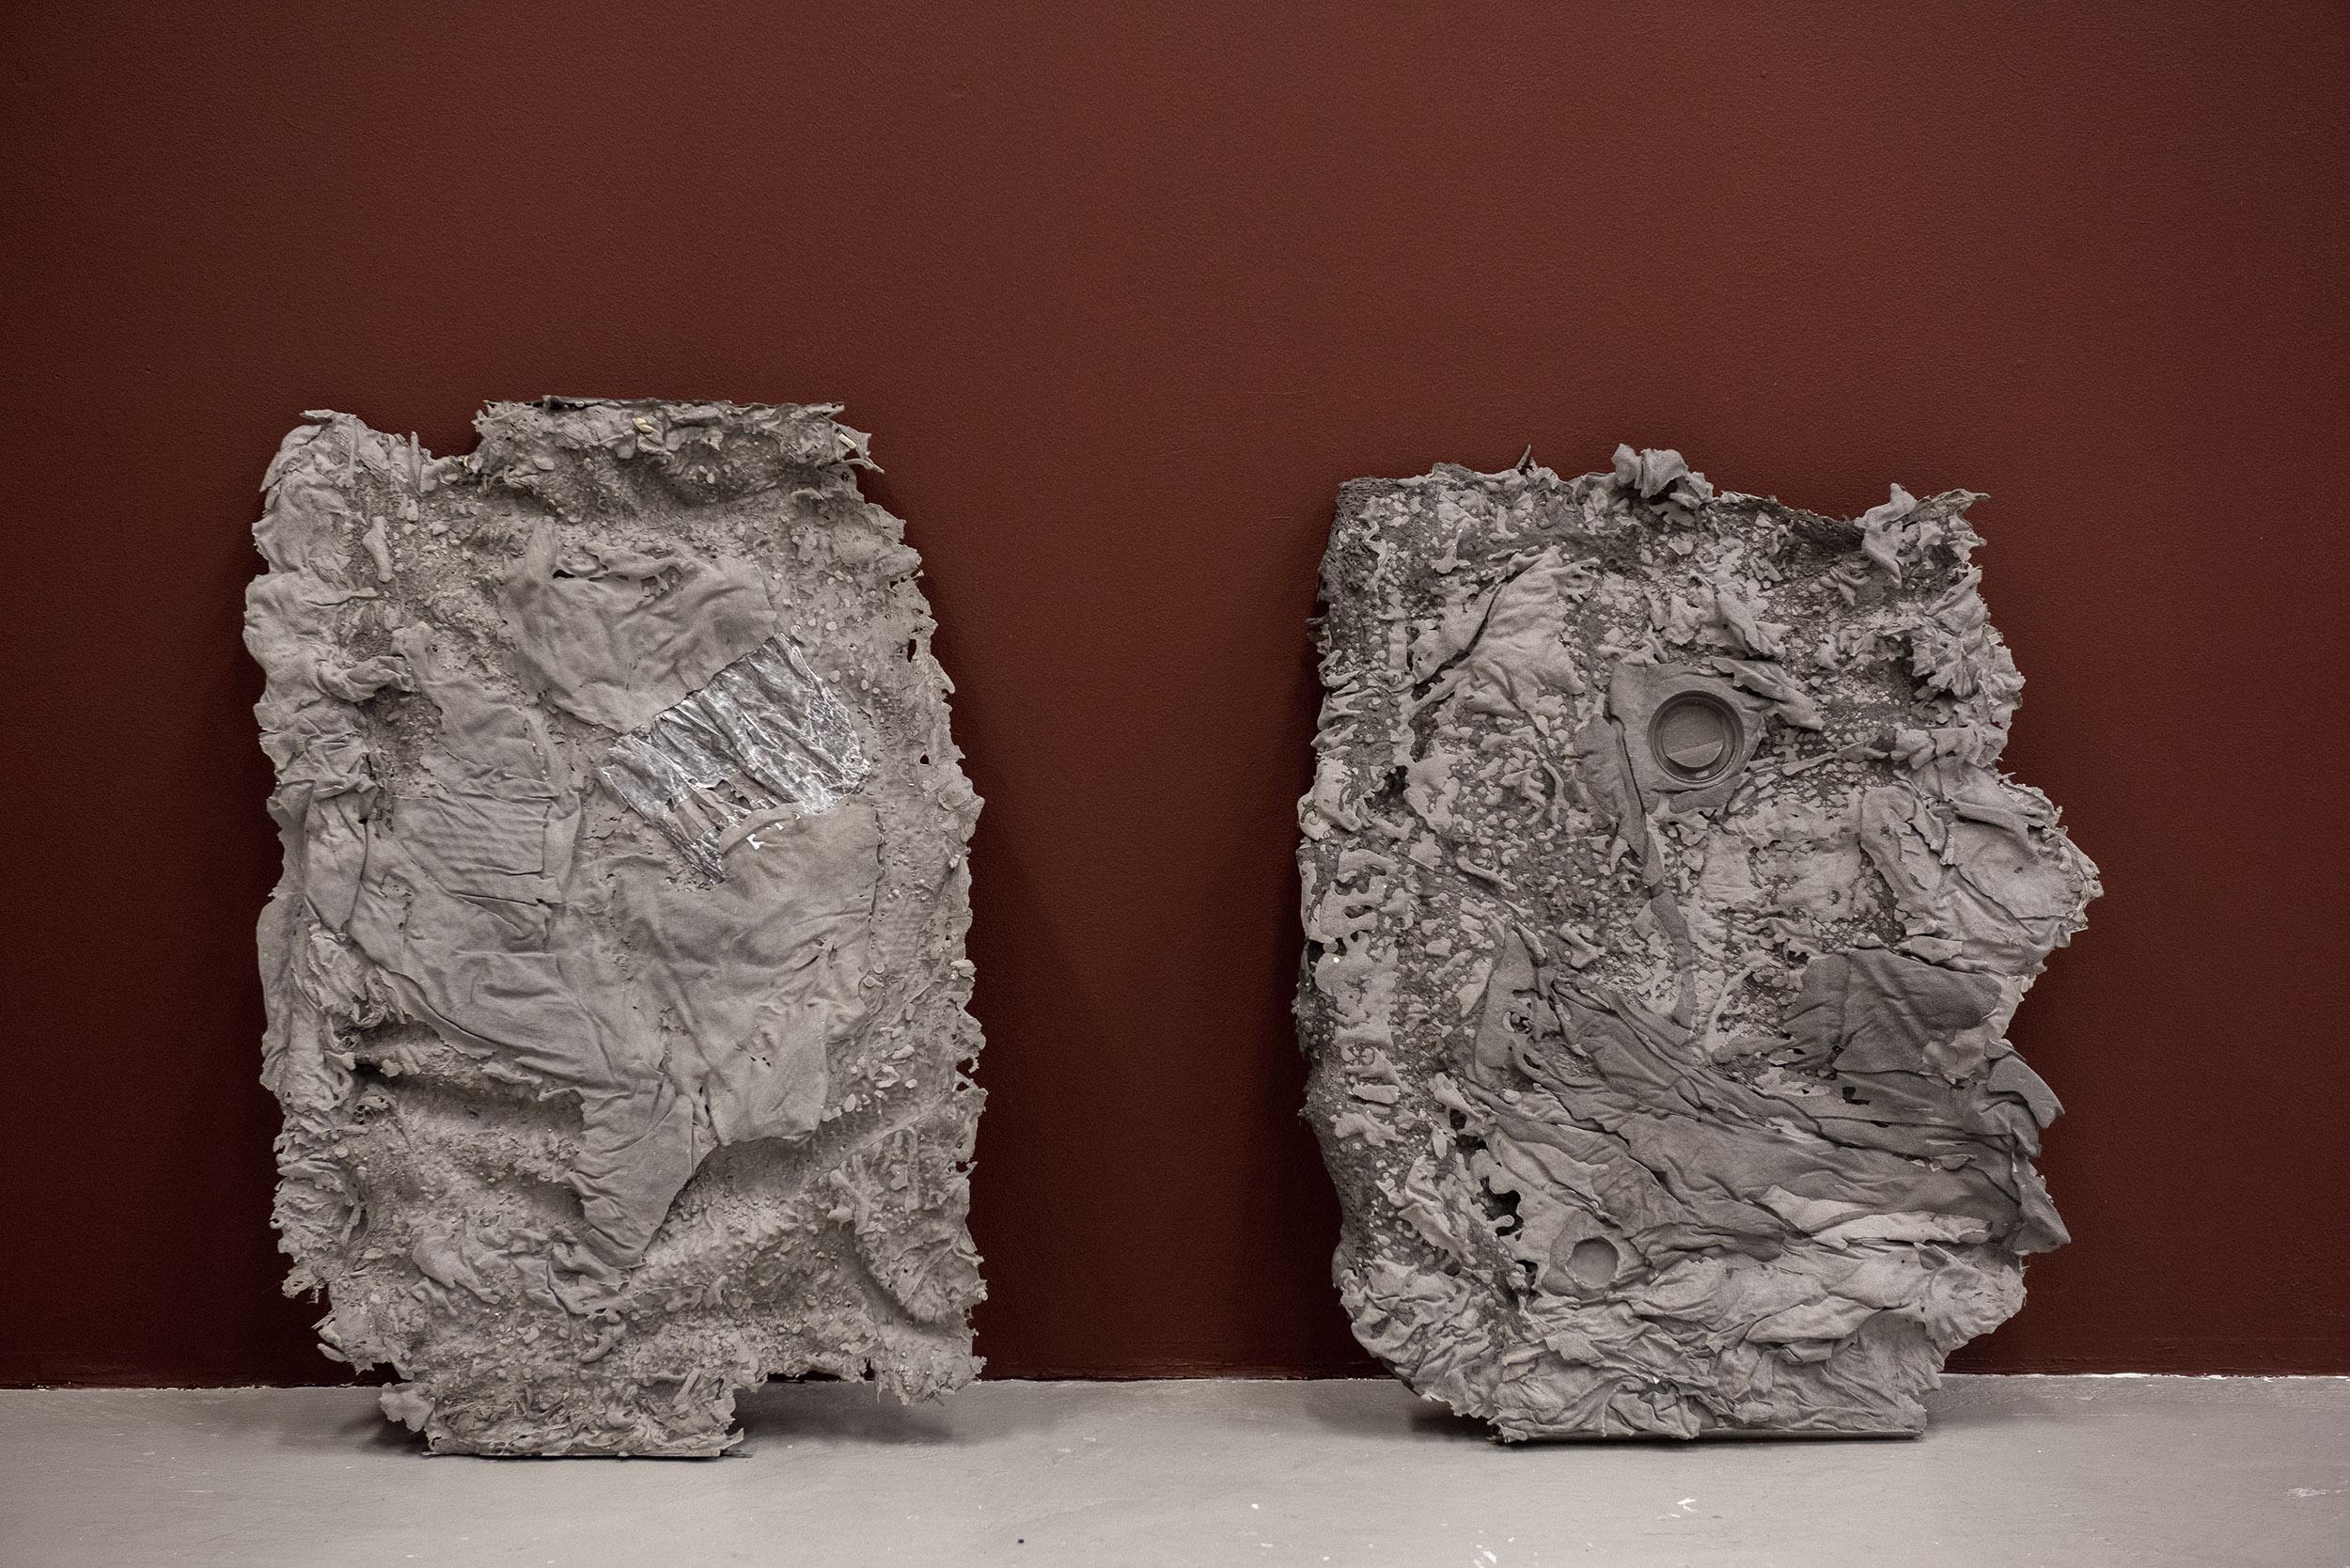 fossil_beds14 kopiera.jpg